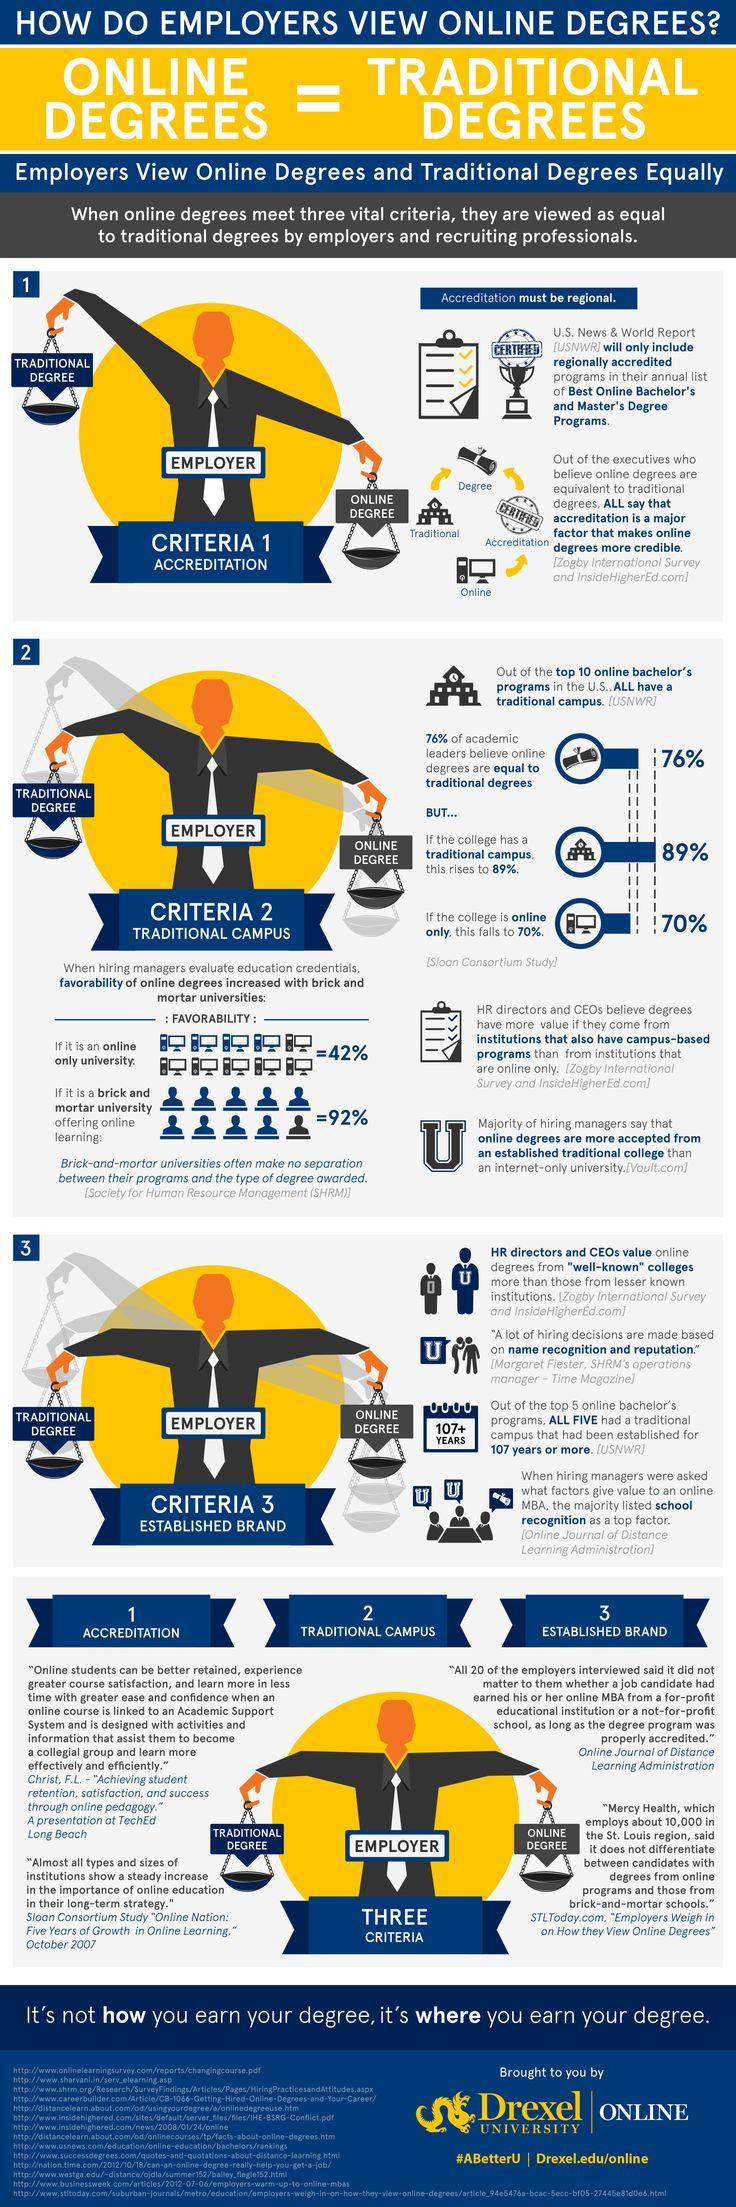 How Do Employers View Online Degrees | Drexel Online | Drexel Online